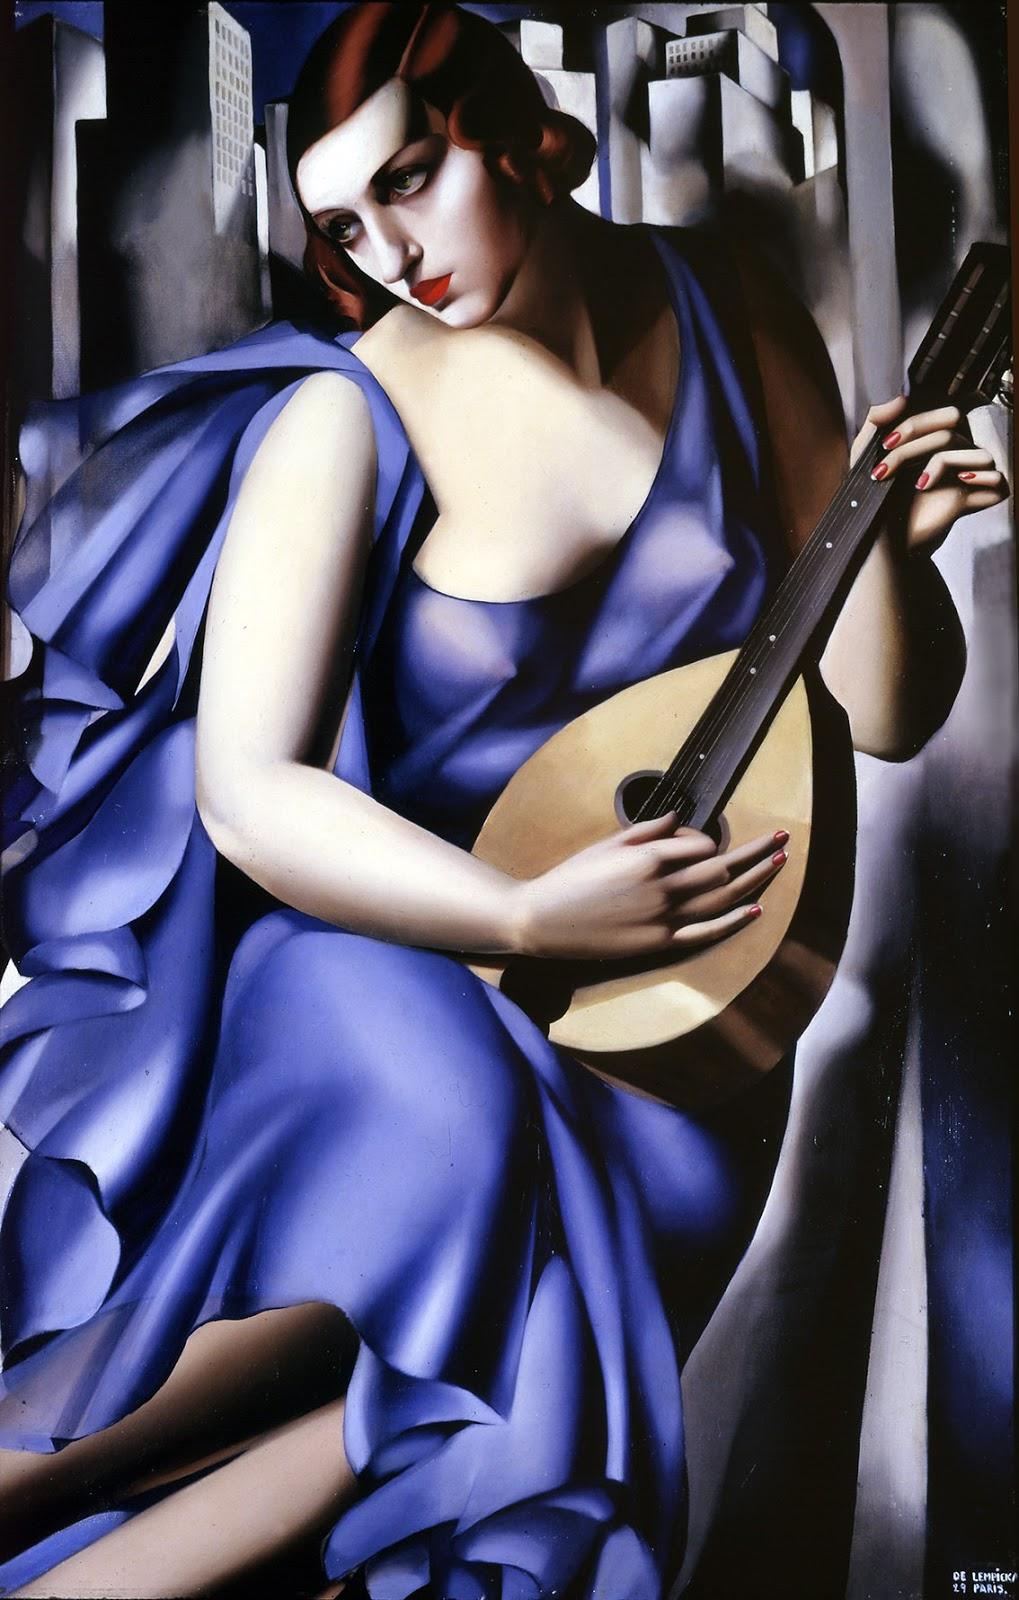 Tamara  De  Lempicka  Donna  blu  con  chitarra